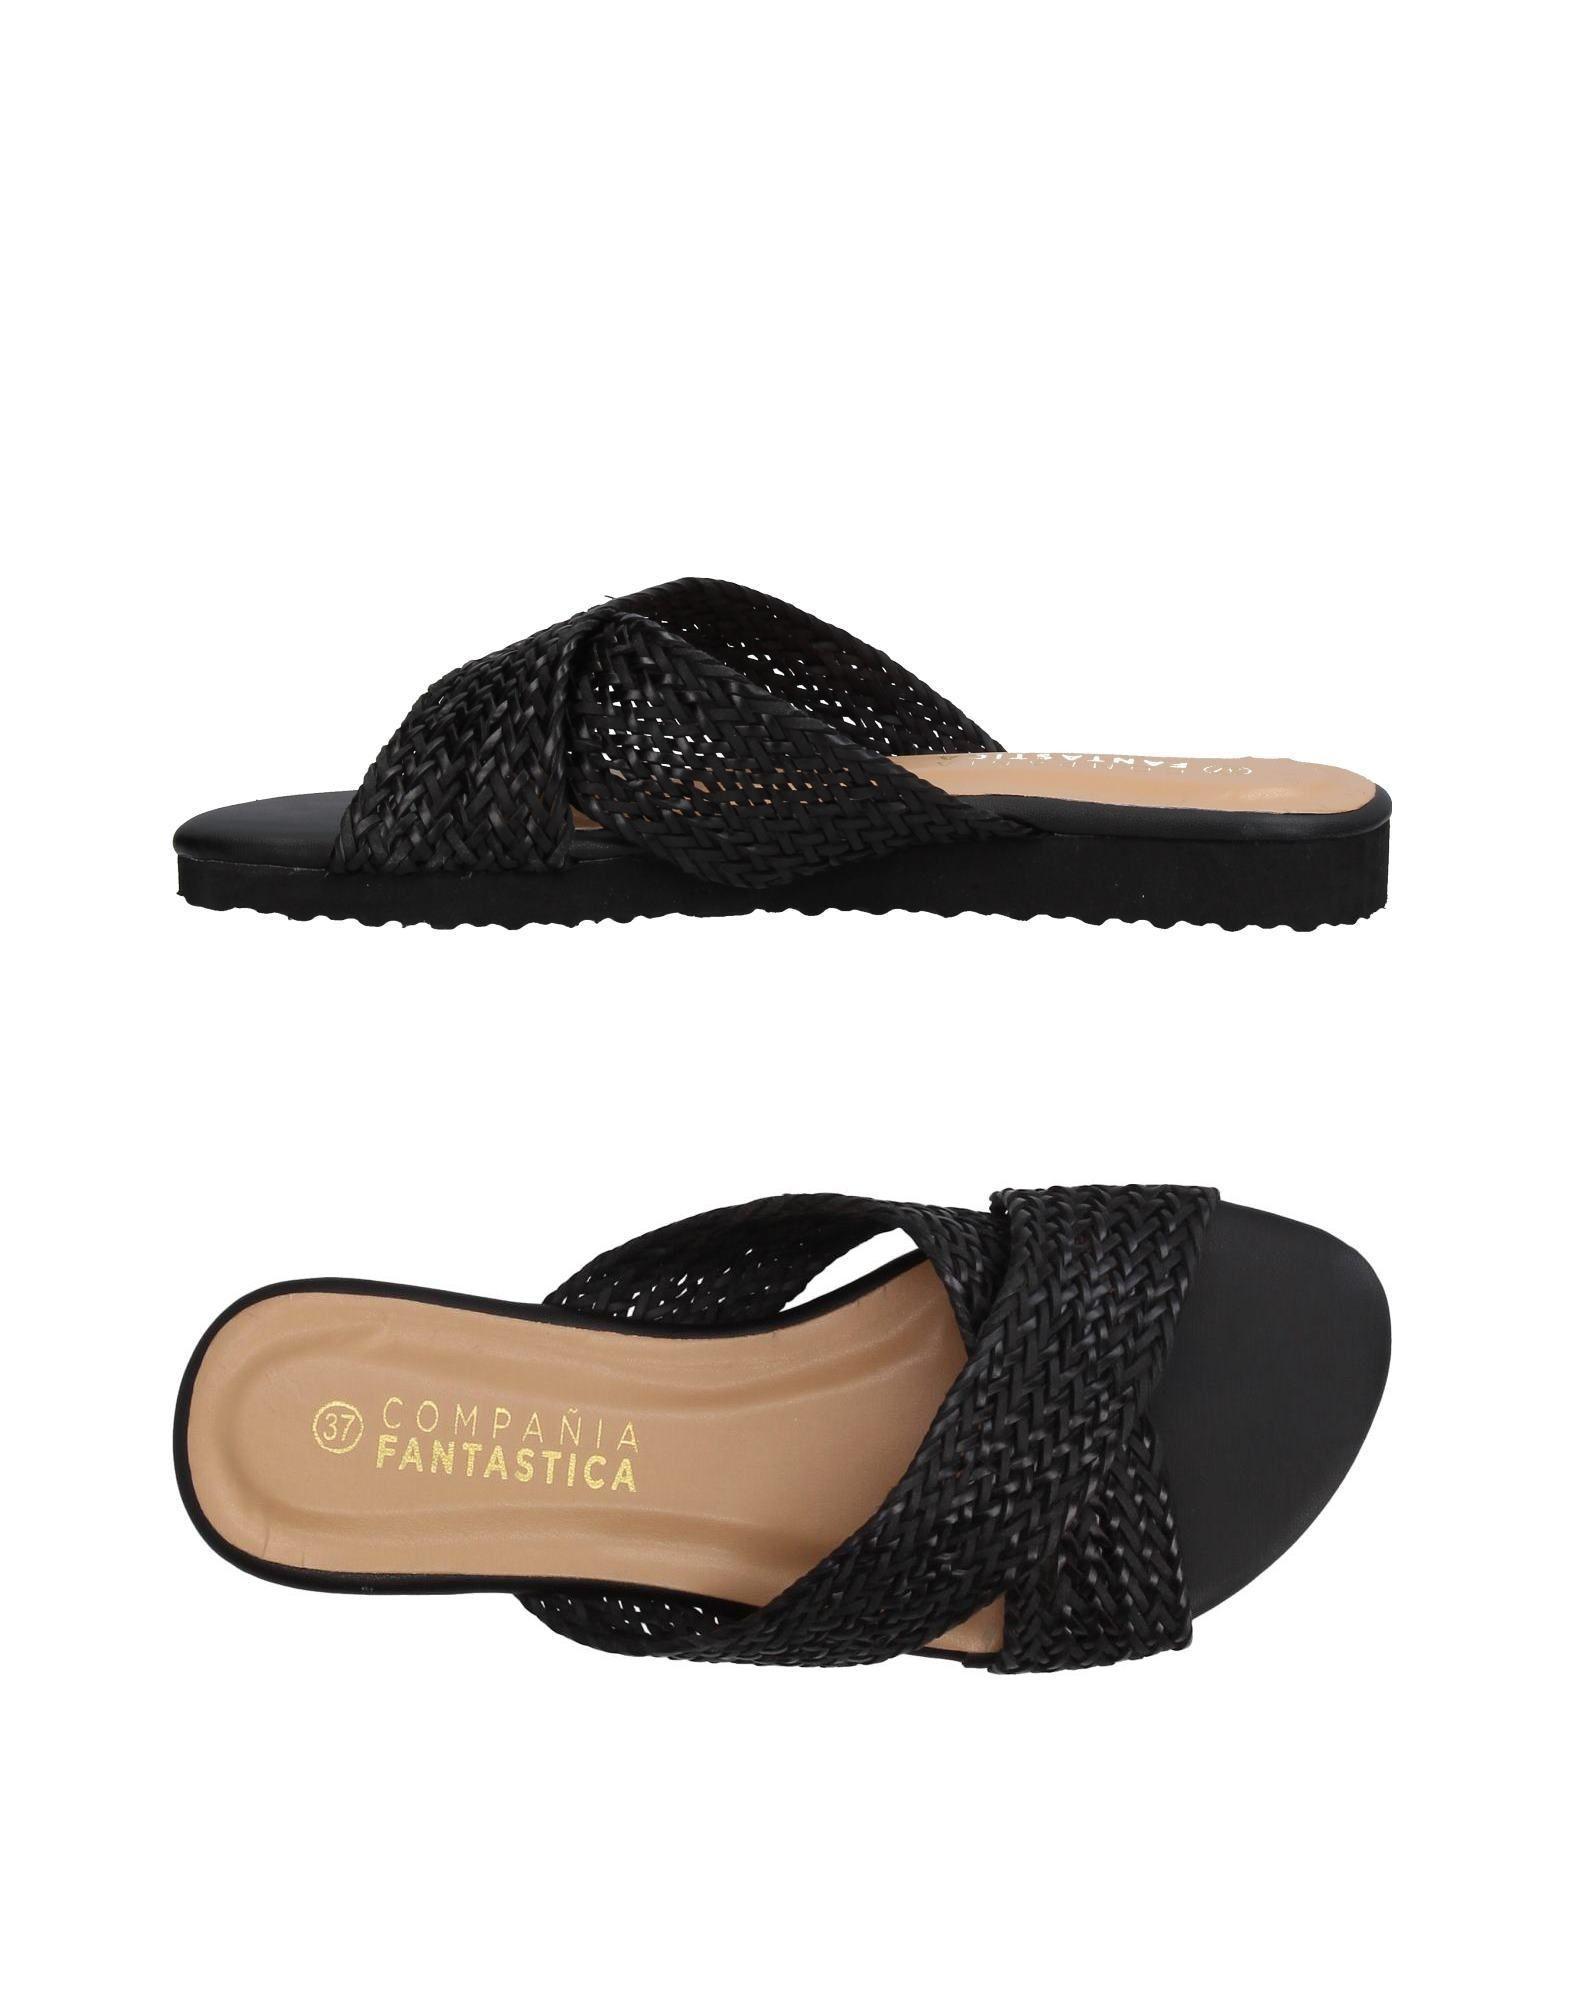 FOOTWEAR - Sandals Compañíafantástica XVW9gIes